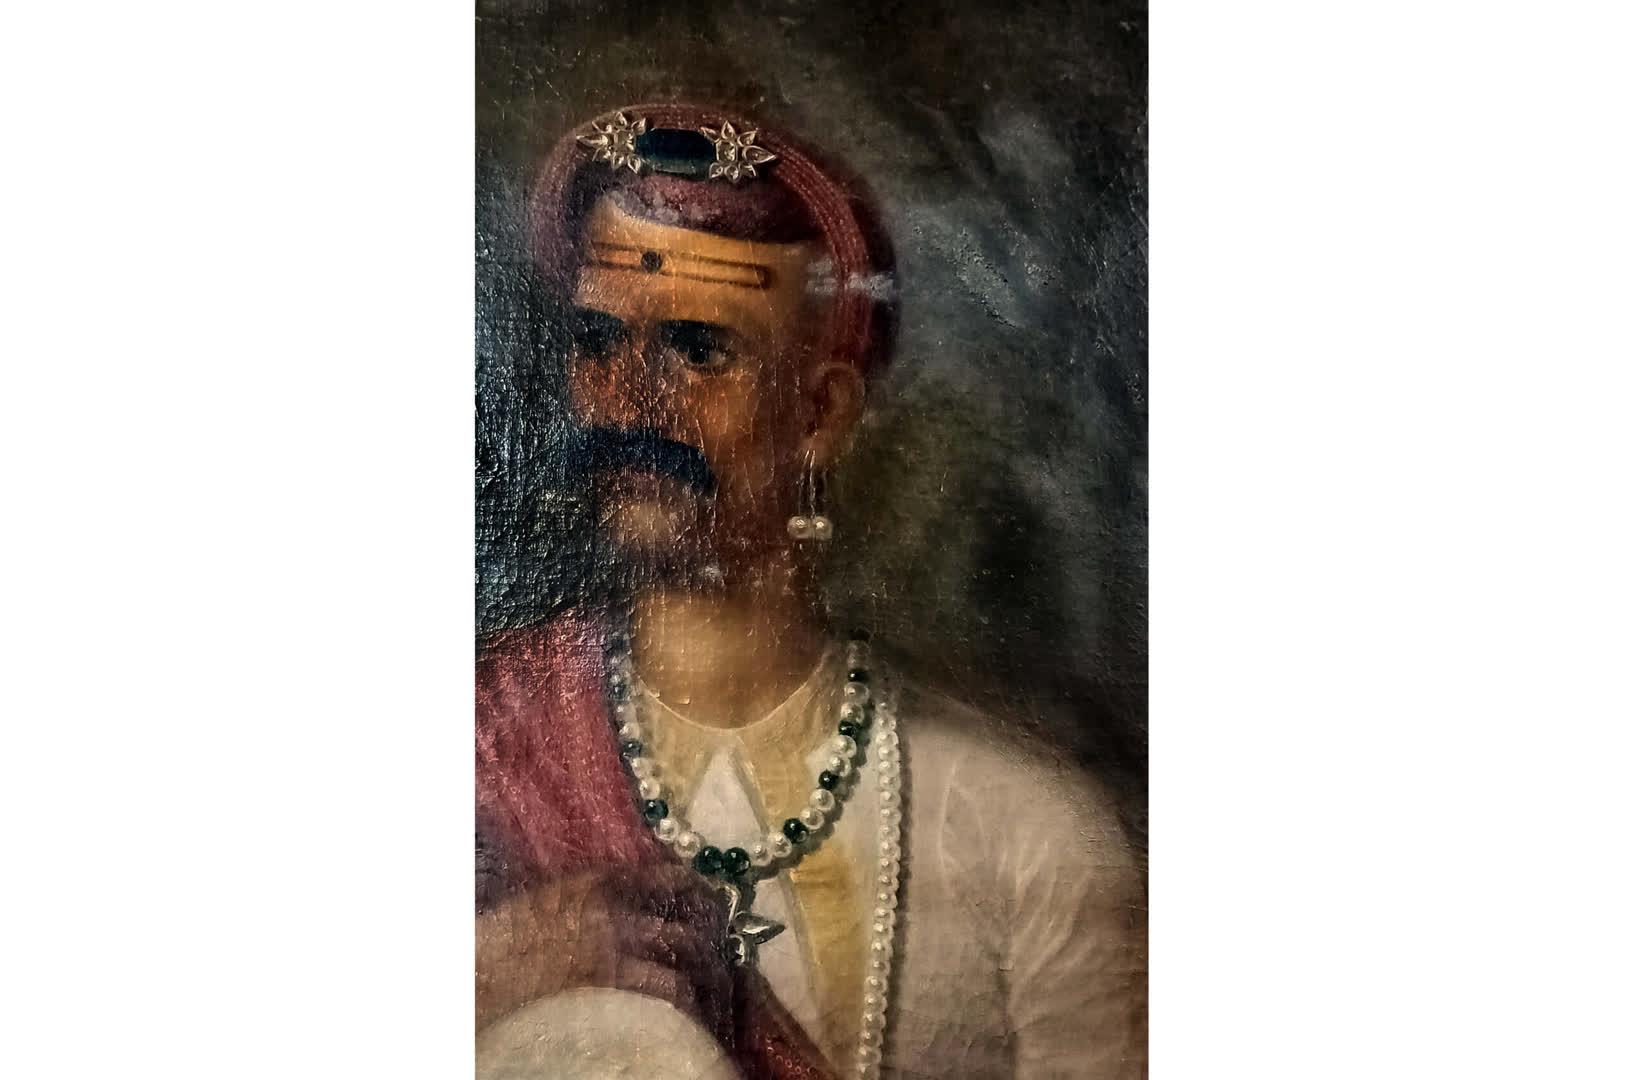 Nana Phadnavis | Directorate of Archaeology and Museums, Govt of Maharashtra